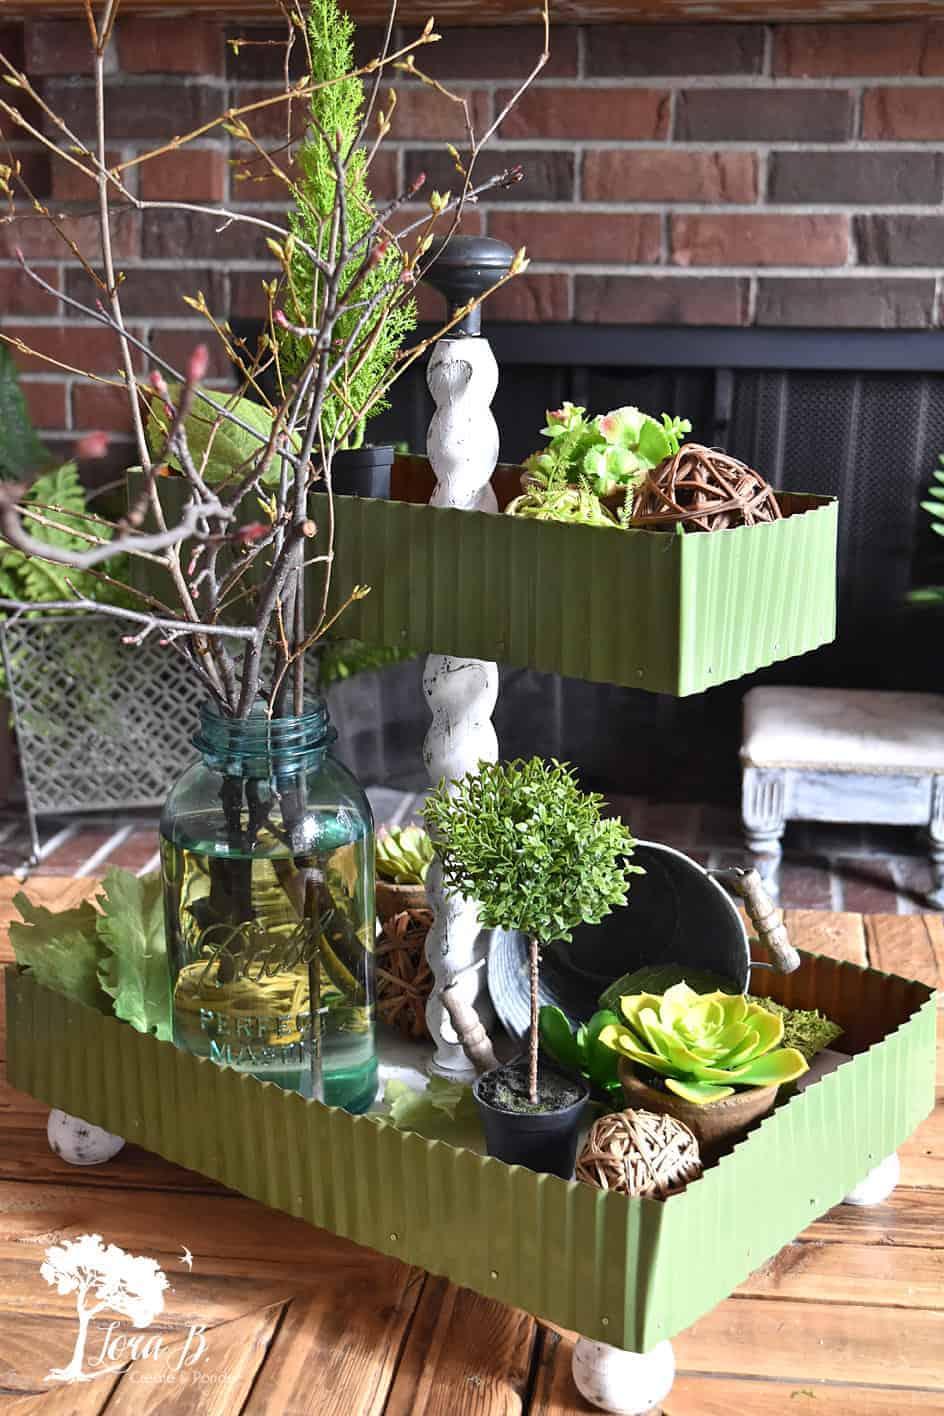 DIY tiered tray